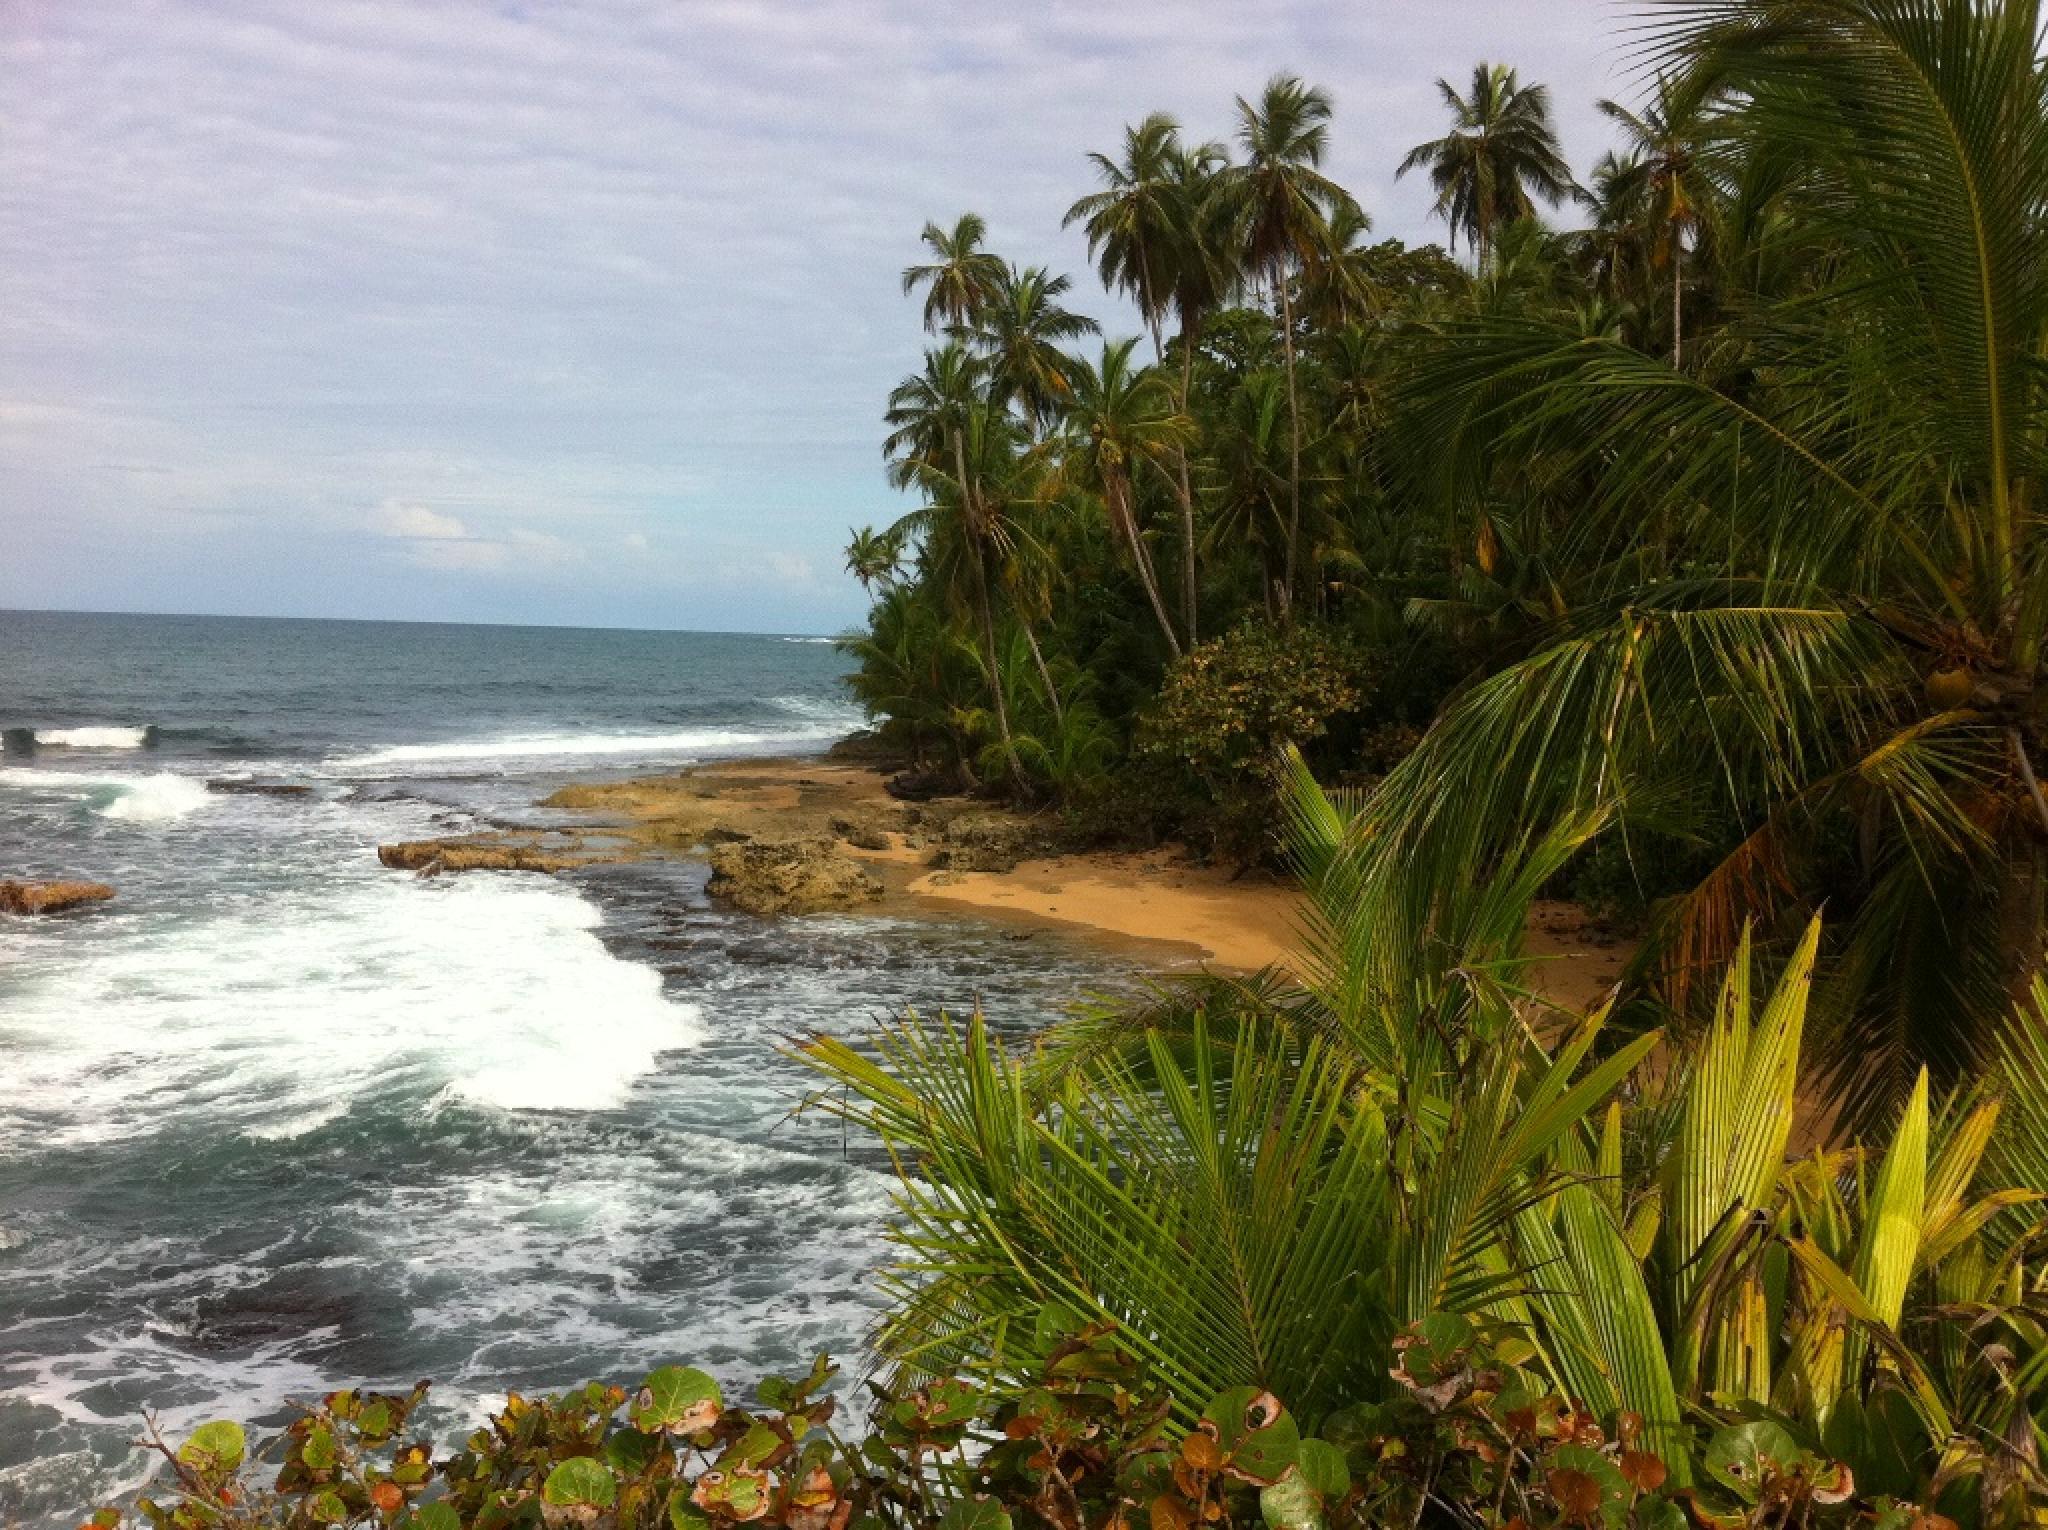 Caminata por la Reserva Silvestre Gandoca Manzanillo